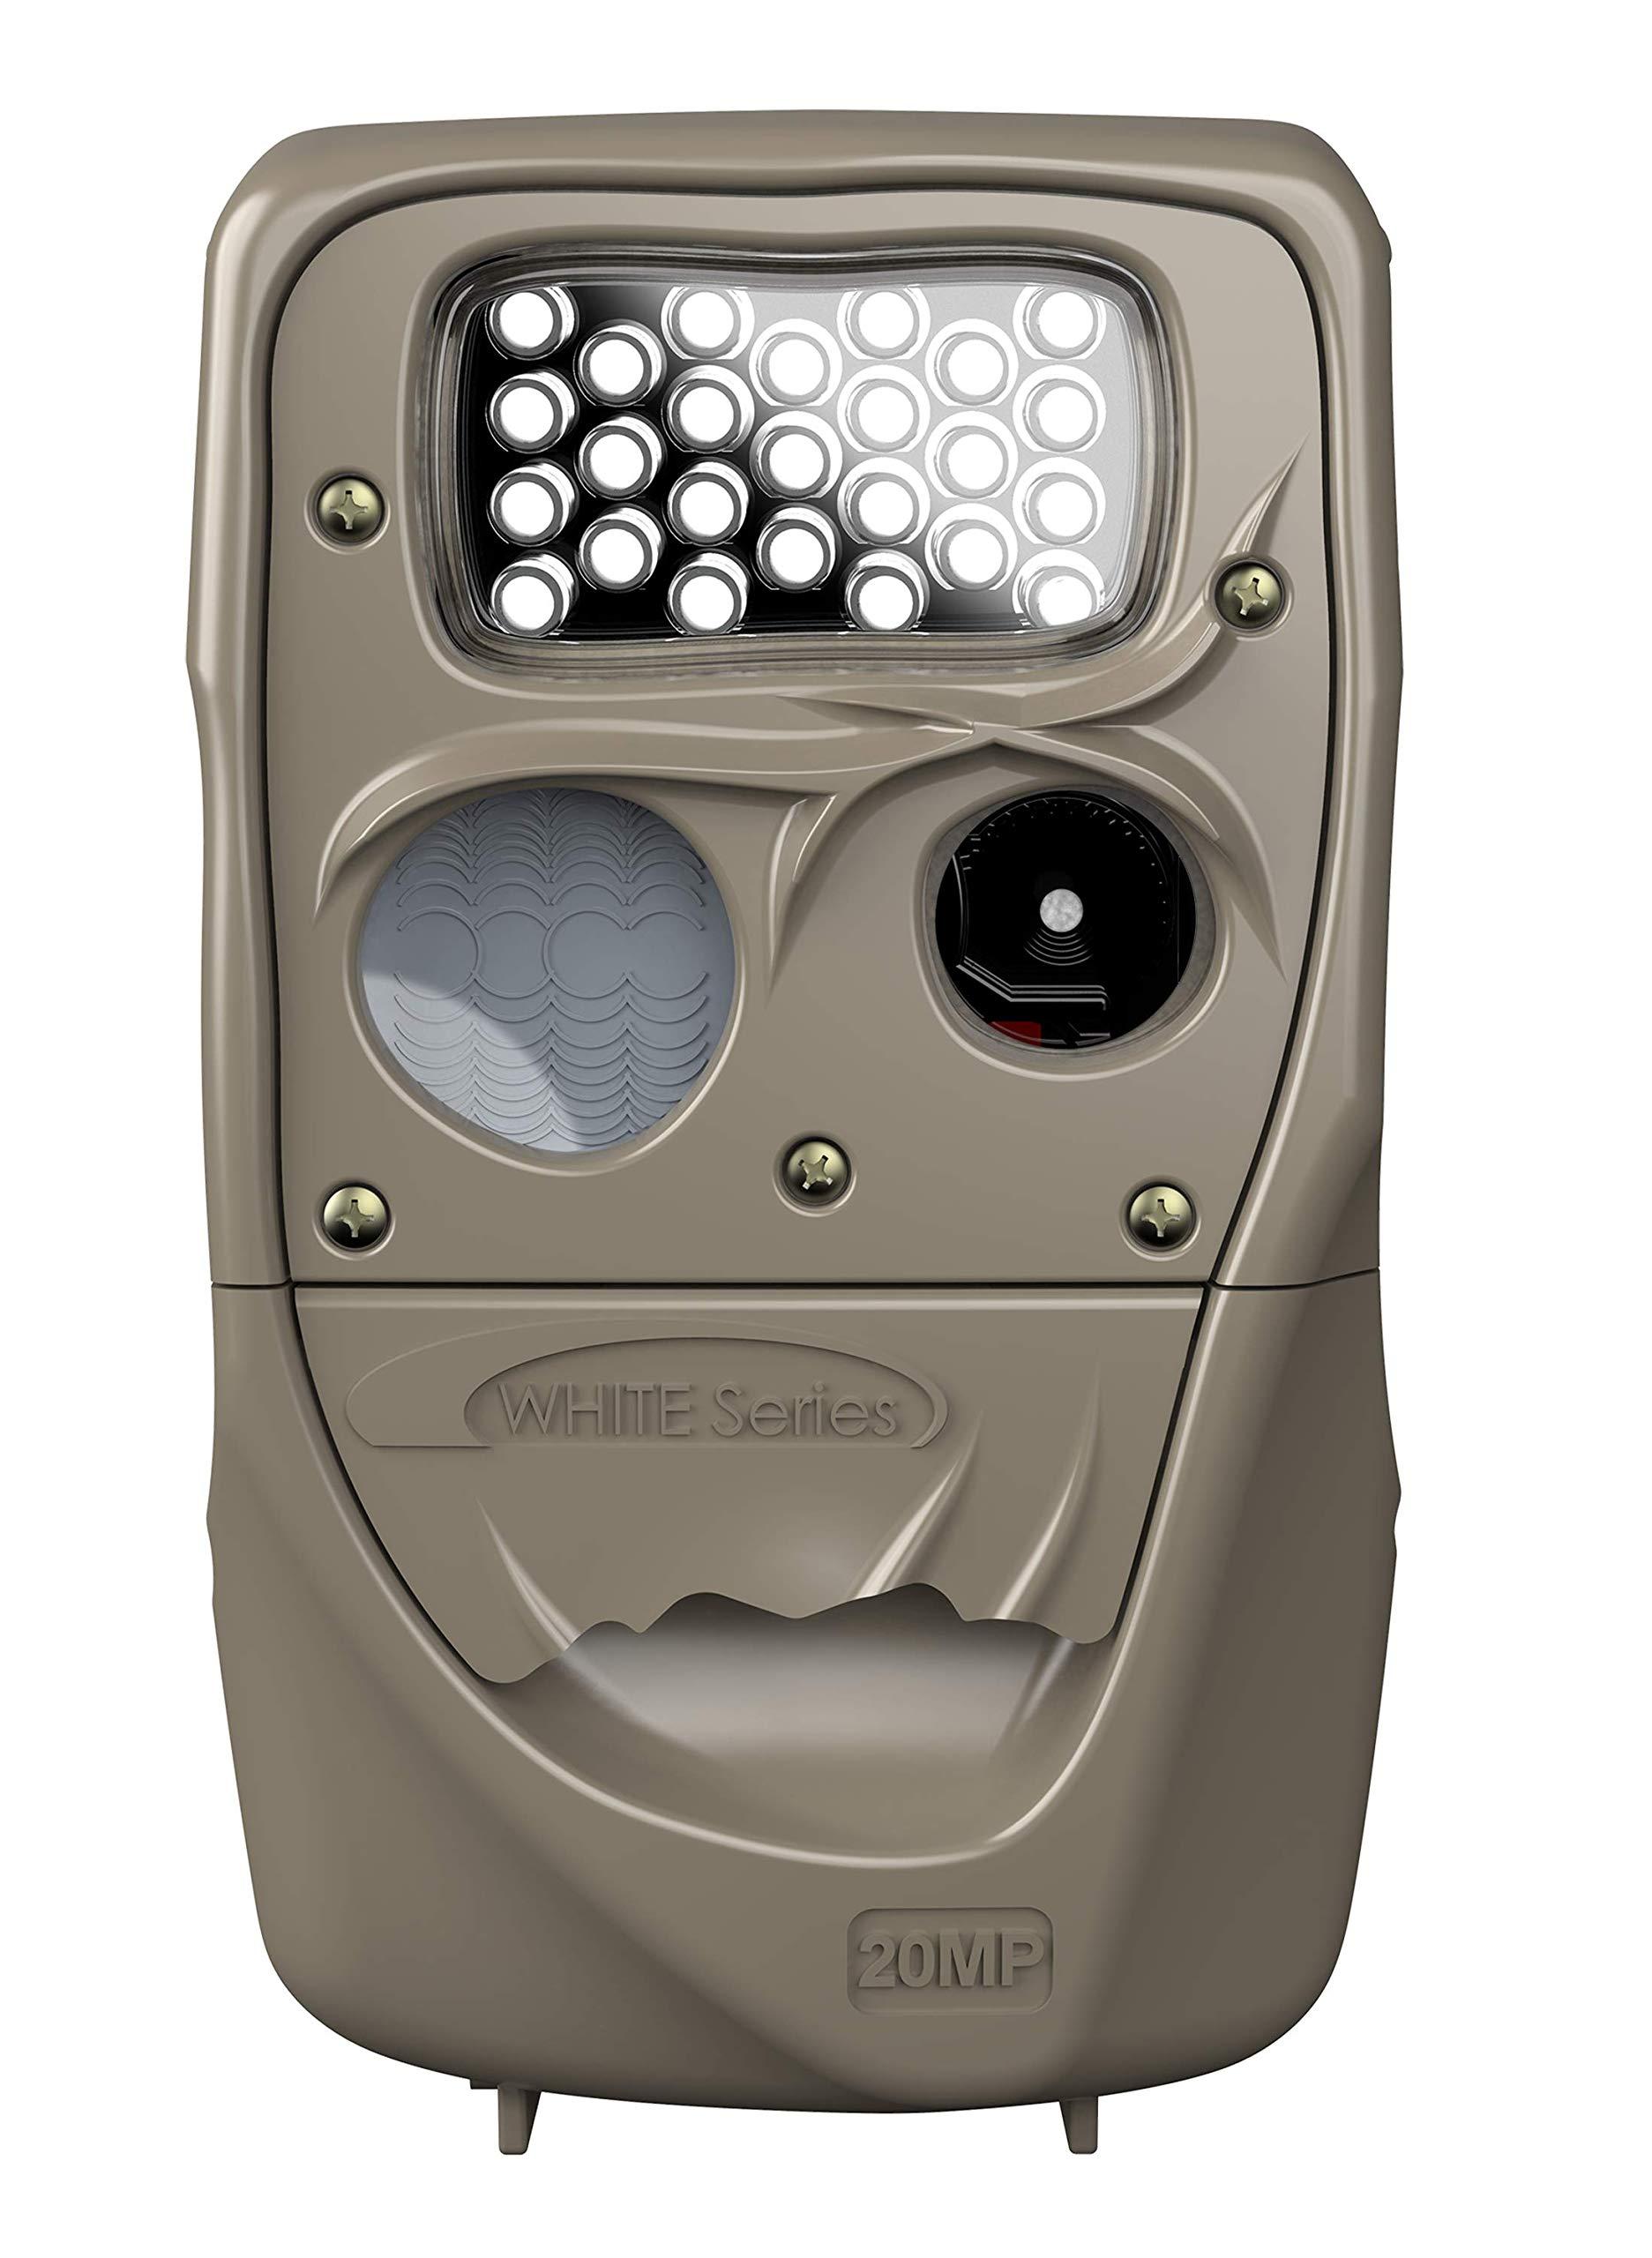 Cuddeback 20 MegaPixel IR, Model# H-1453